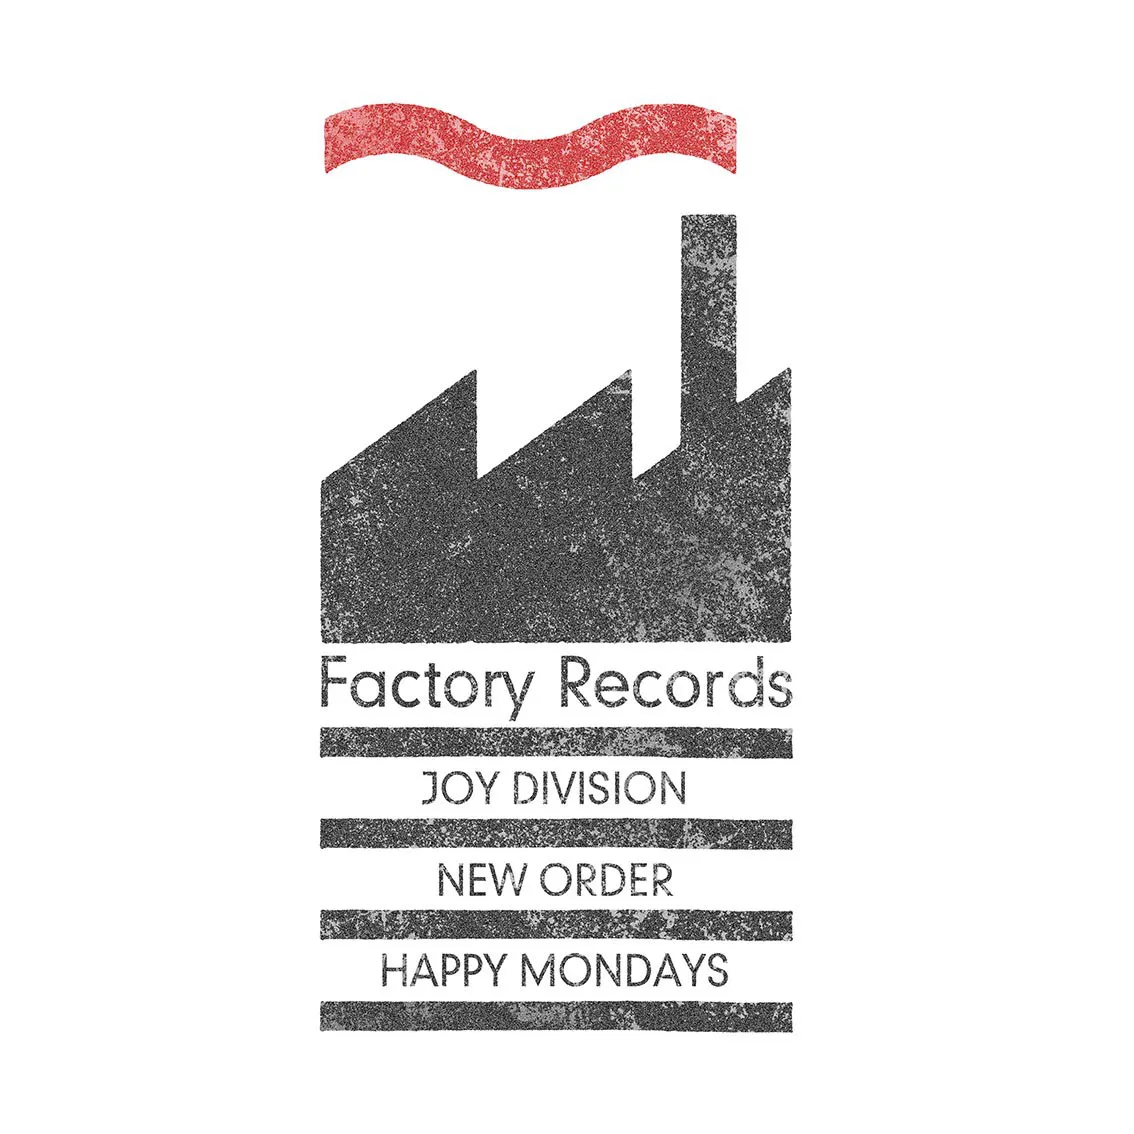 Quadro A4 - Factory Records